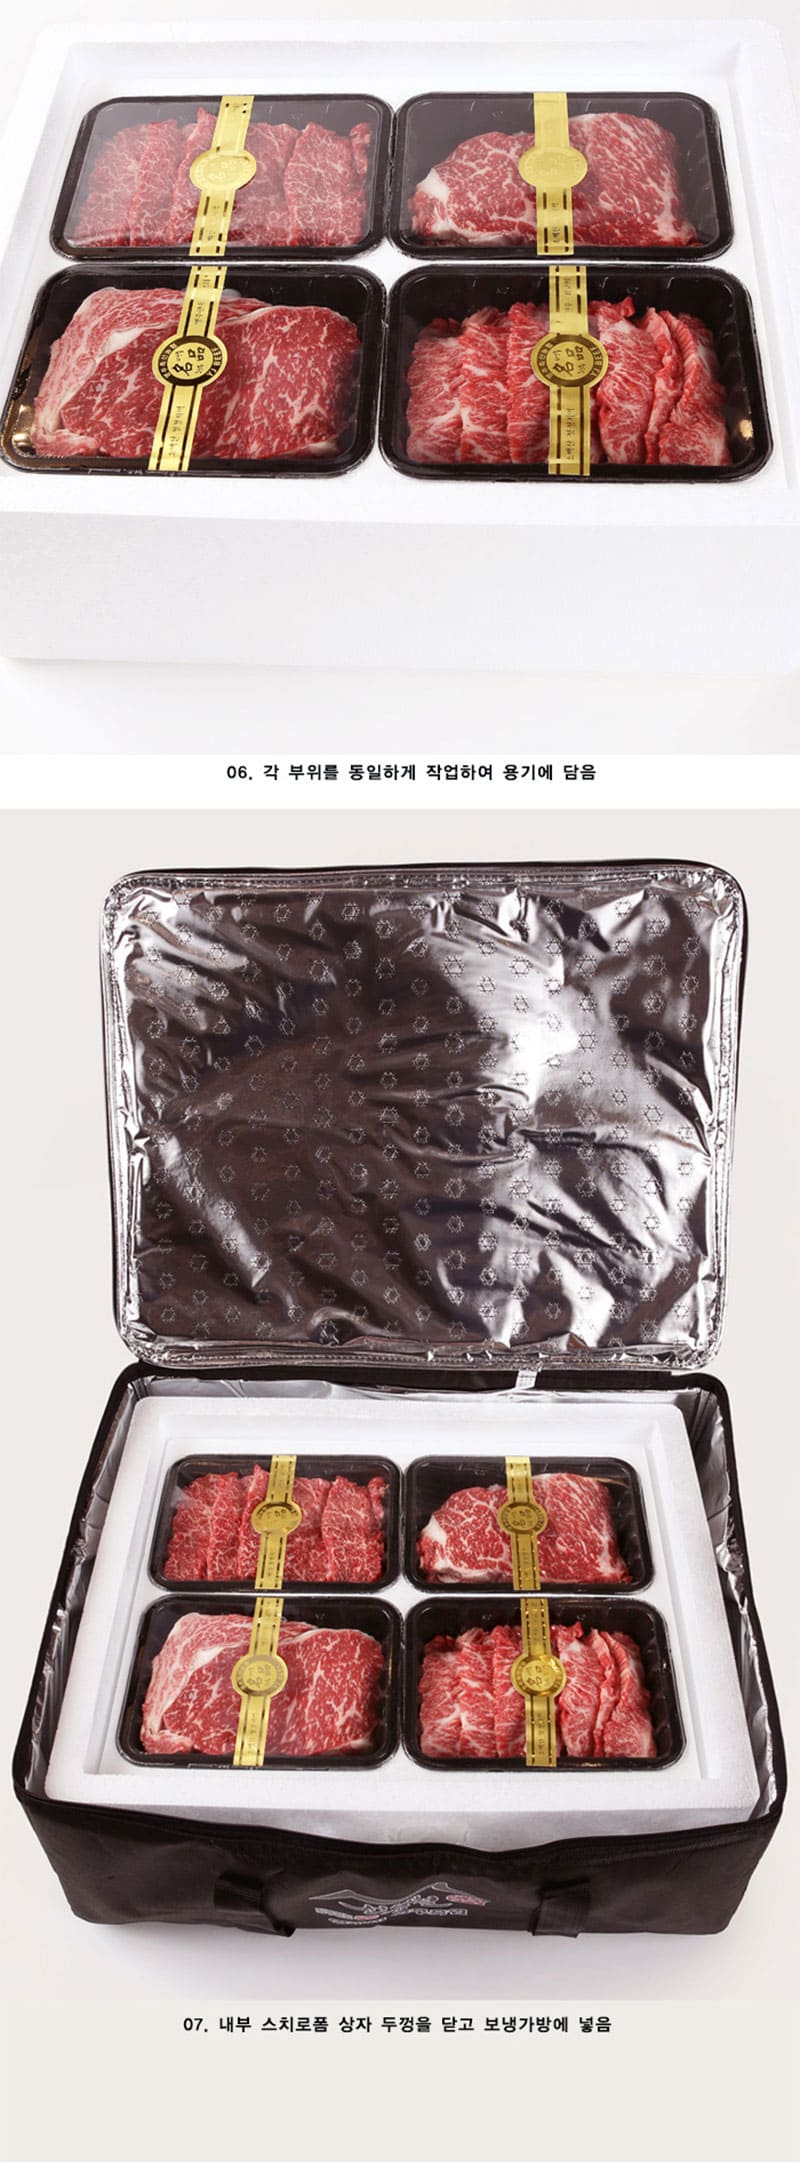 yeongjuchughyeob-myeongpum-set_detail_07.jpg